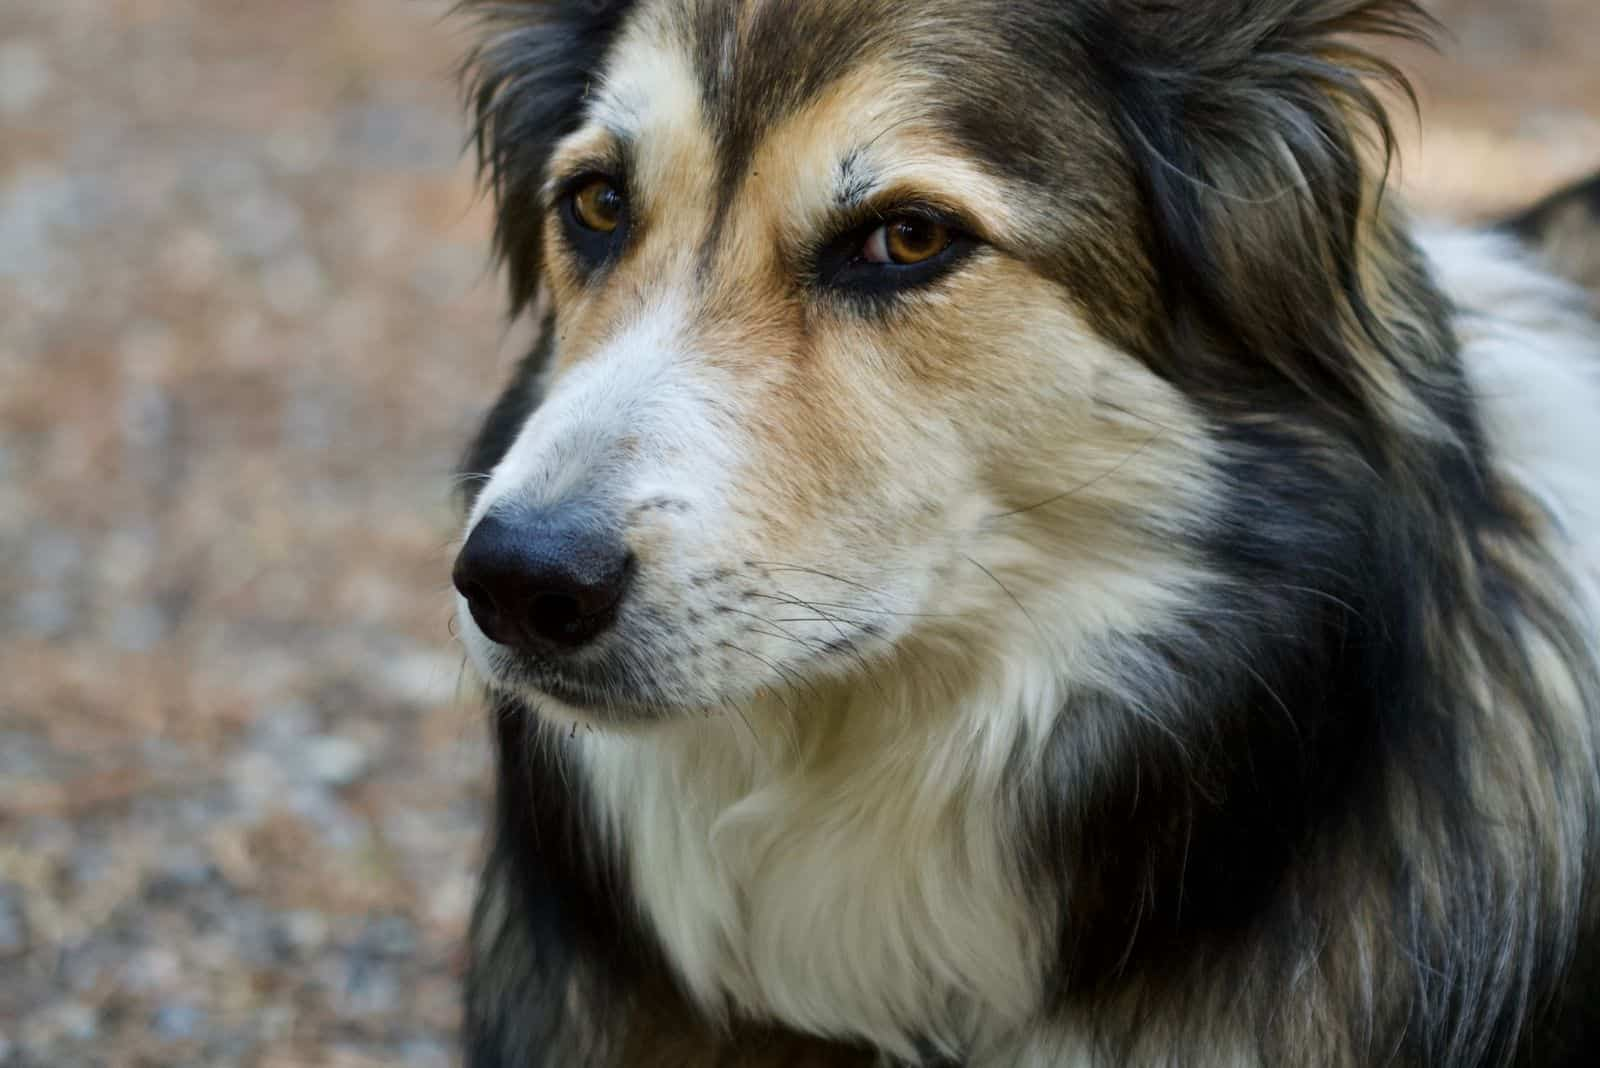 german shepherd collie cross breed dog in close up image